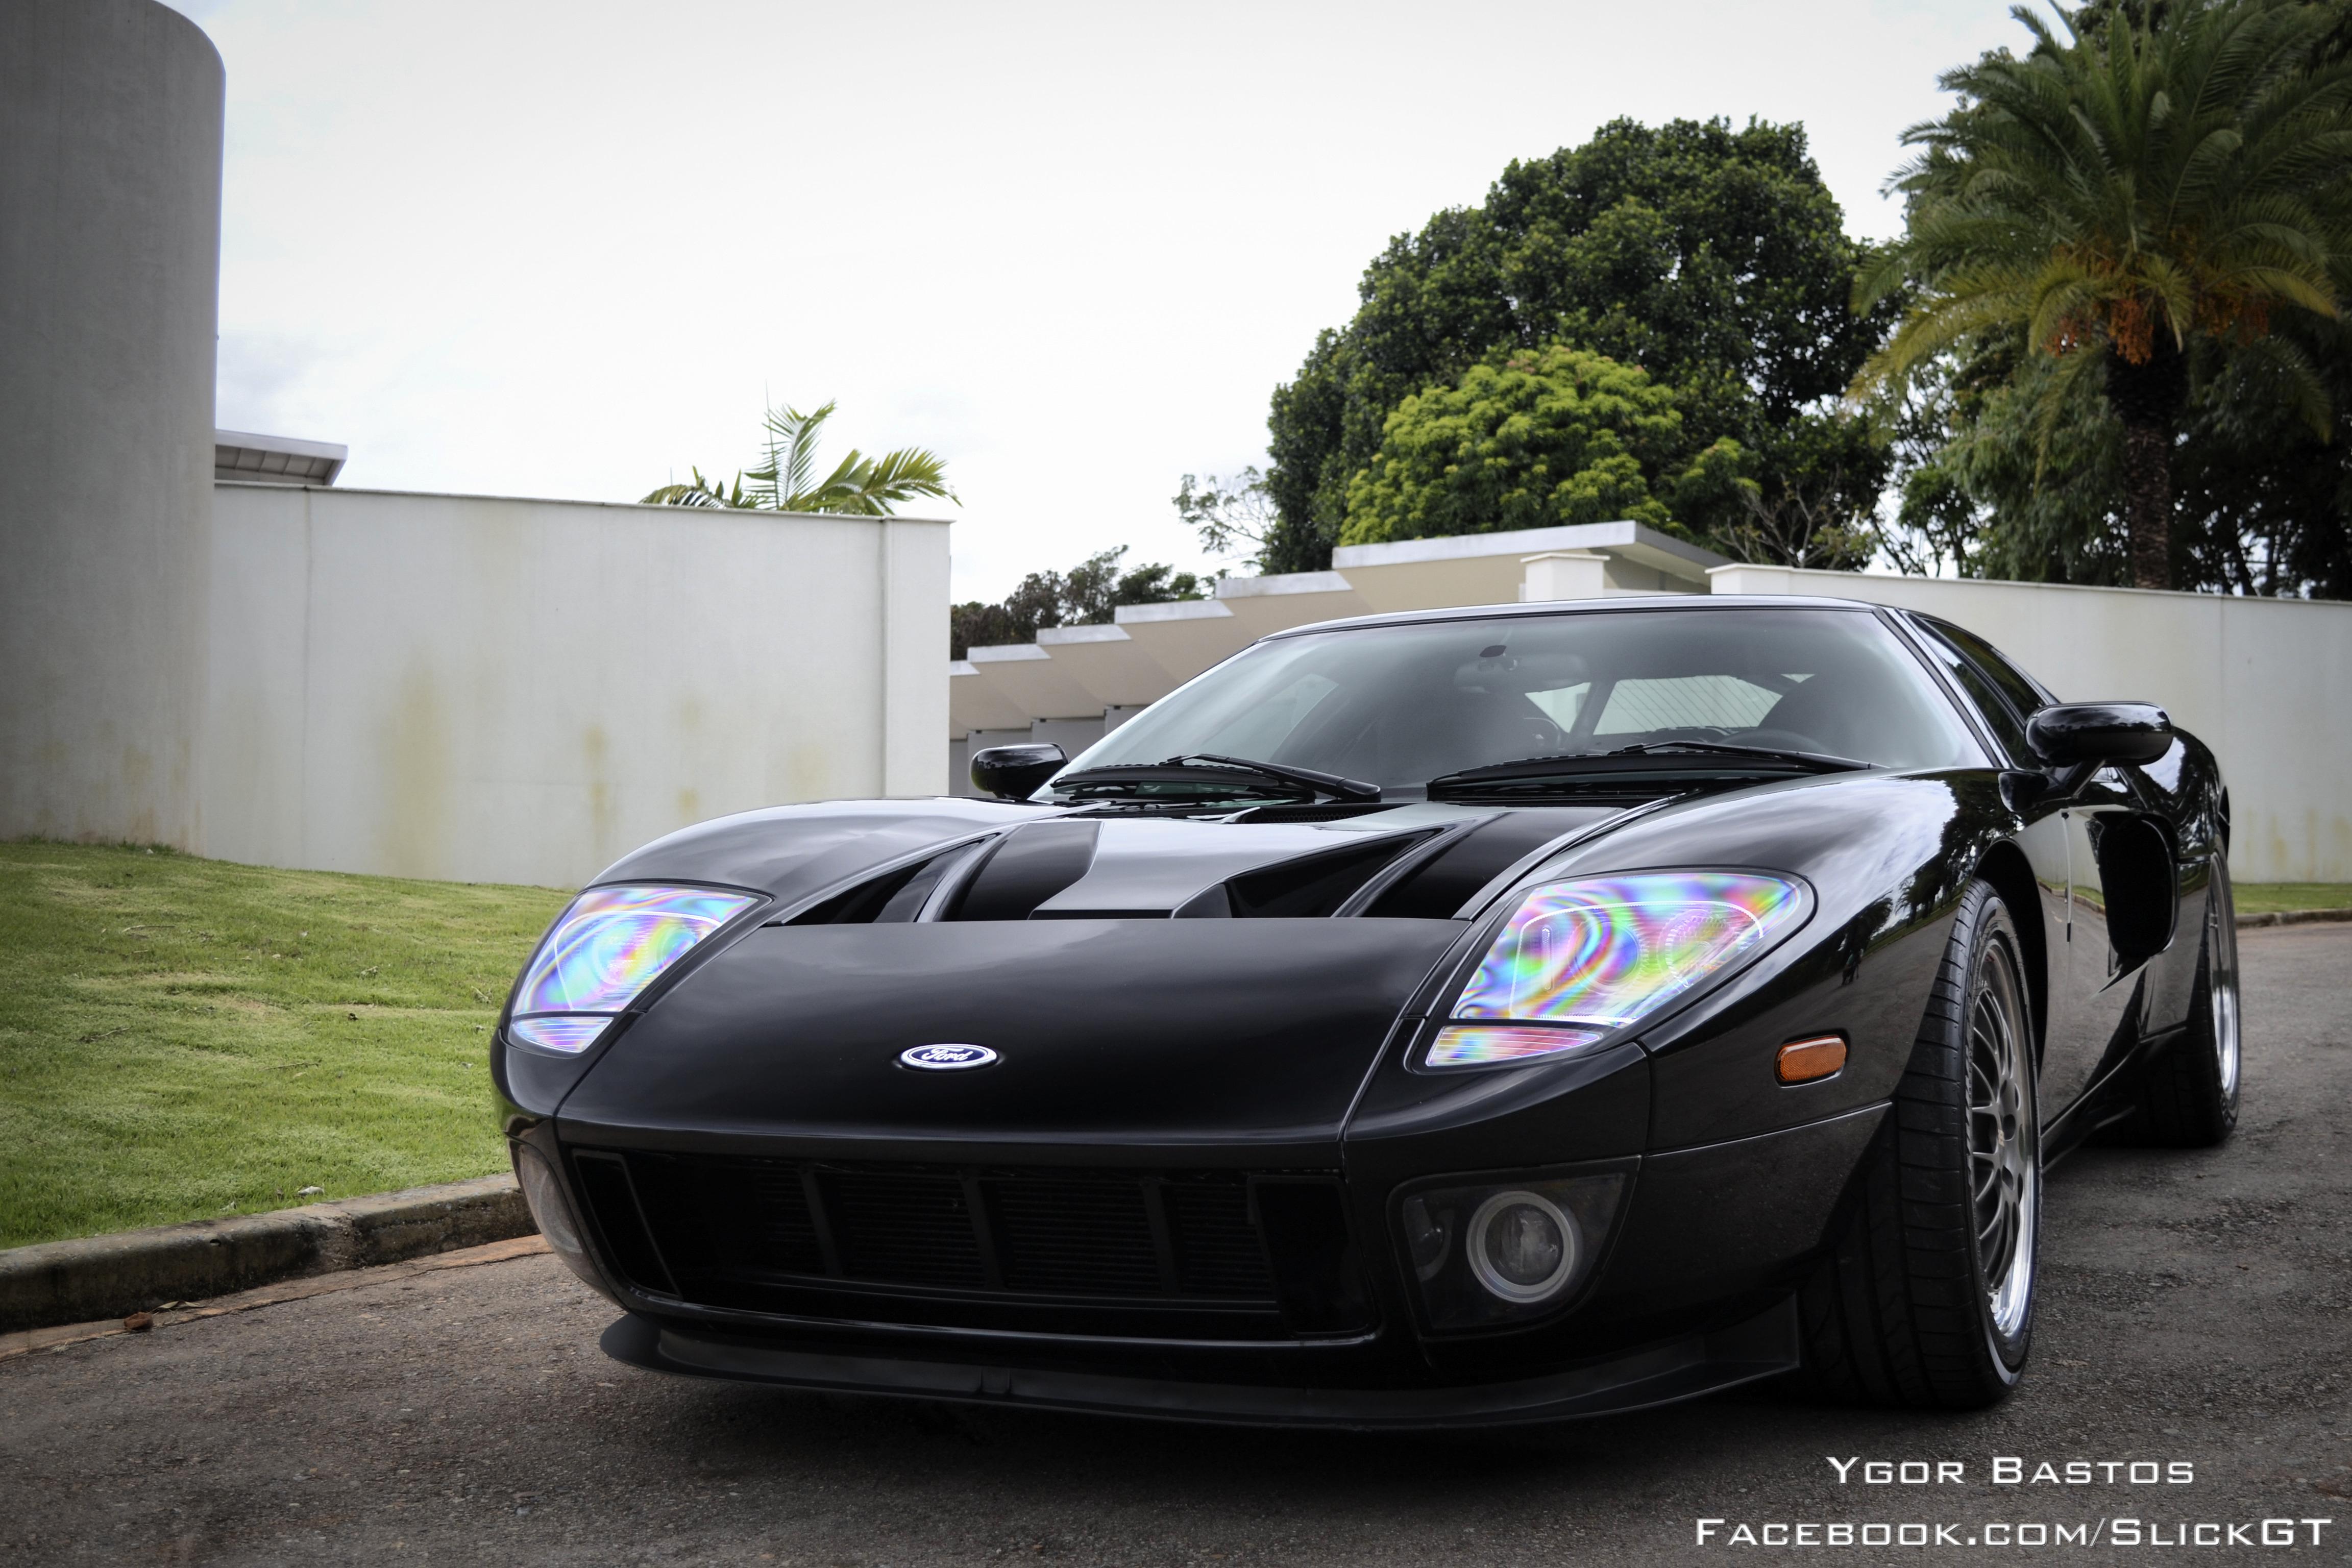 Wallpaper : black, sports car, Ford GT, Brazil, Brasil